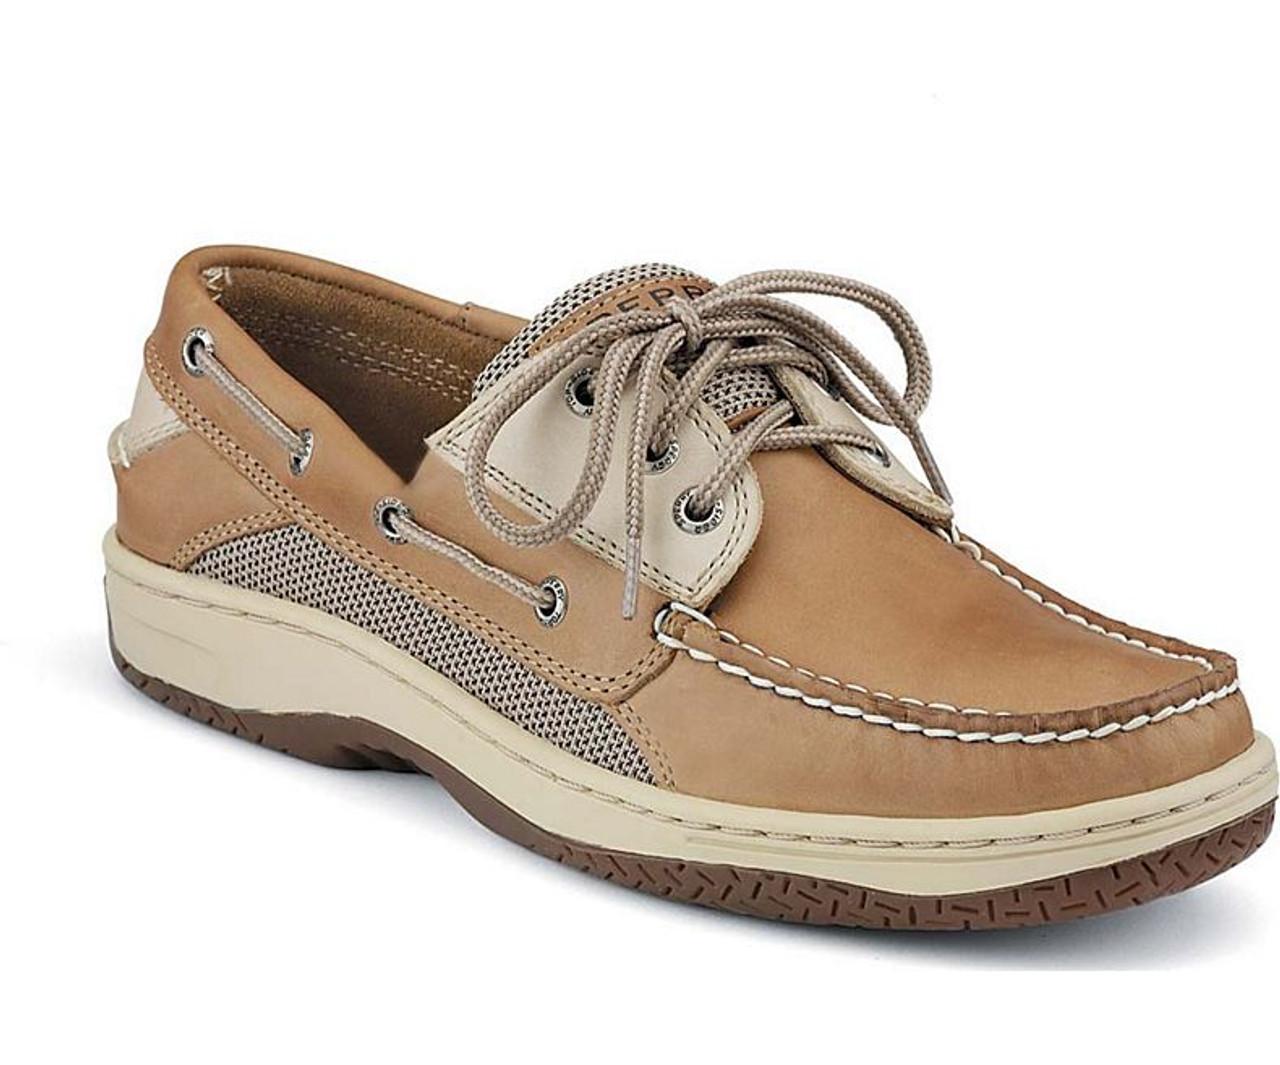 Chaussures Bateau Homme Sperry Top-Sider Billfish 3-Eye